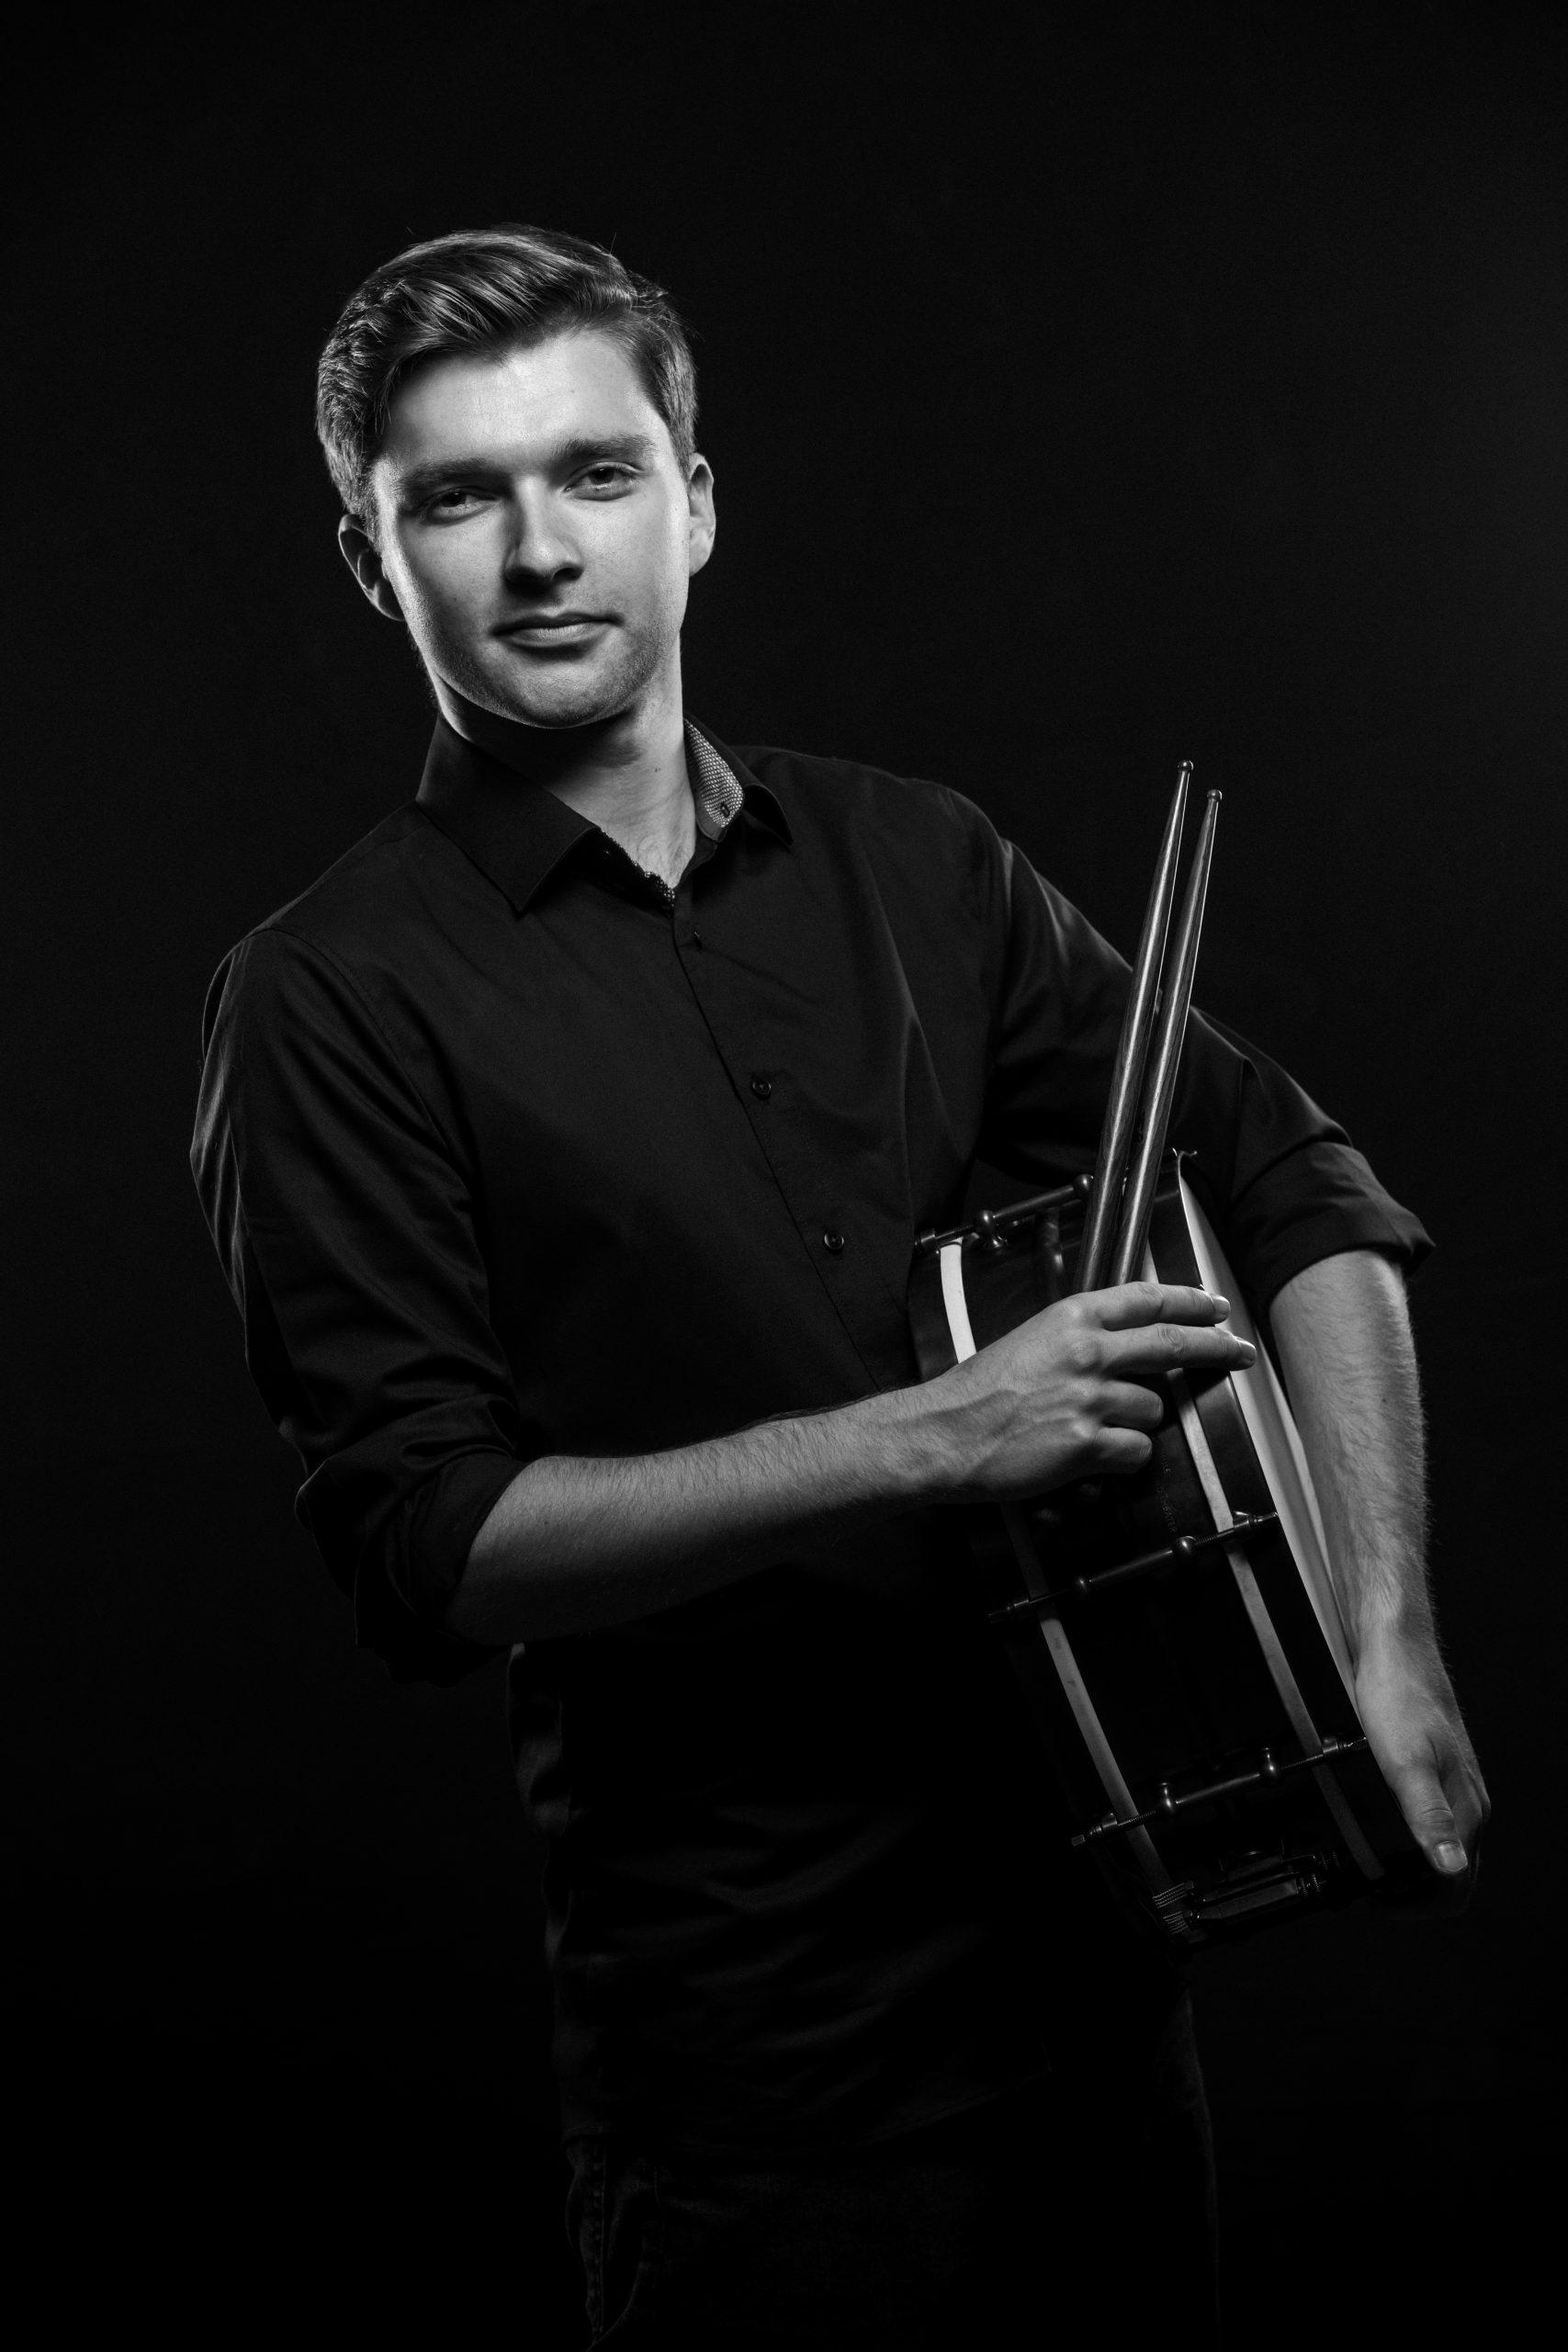 Felix Birnbaum